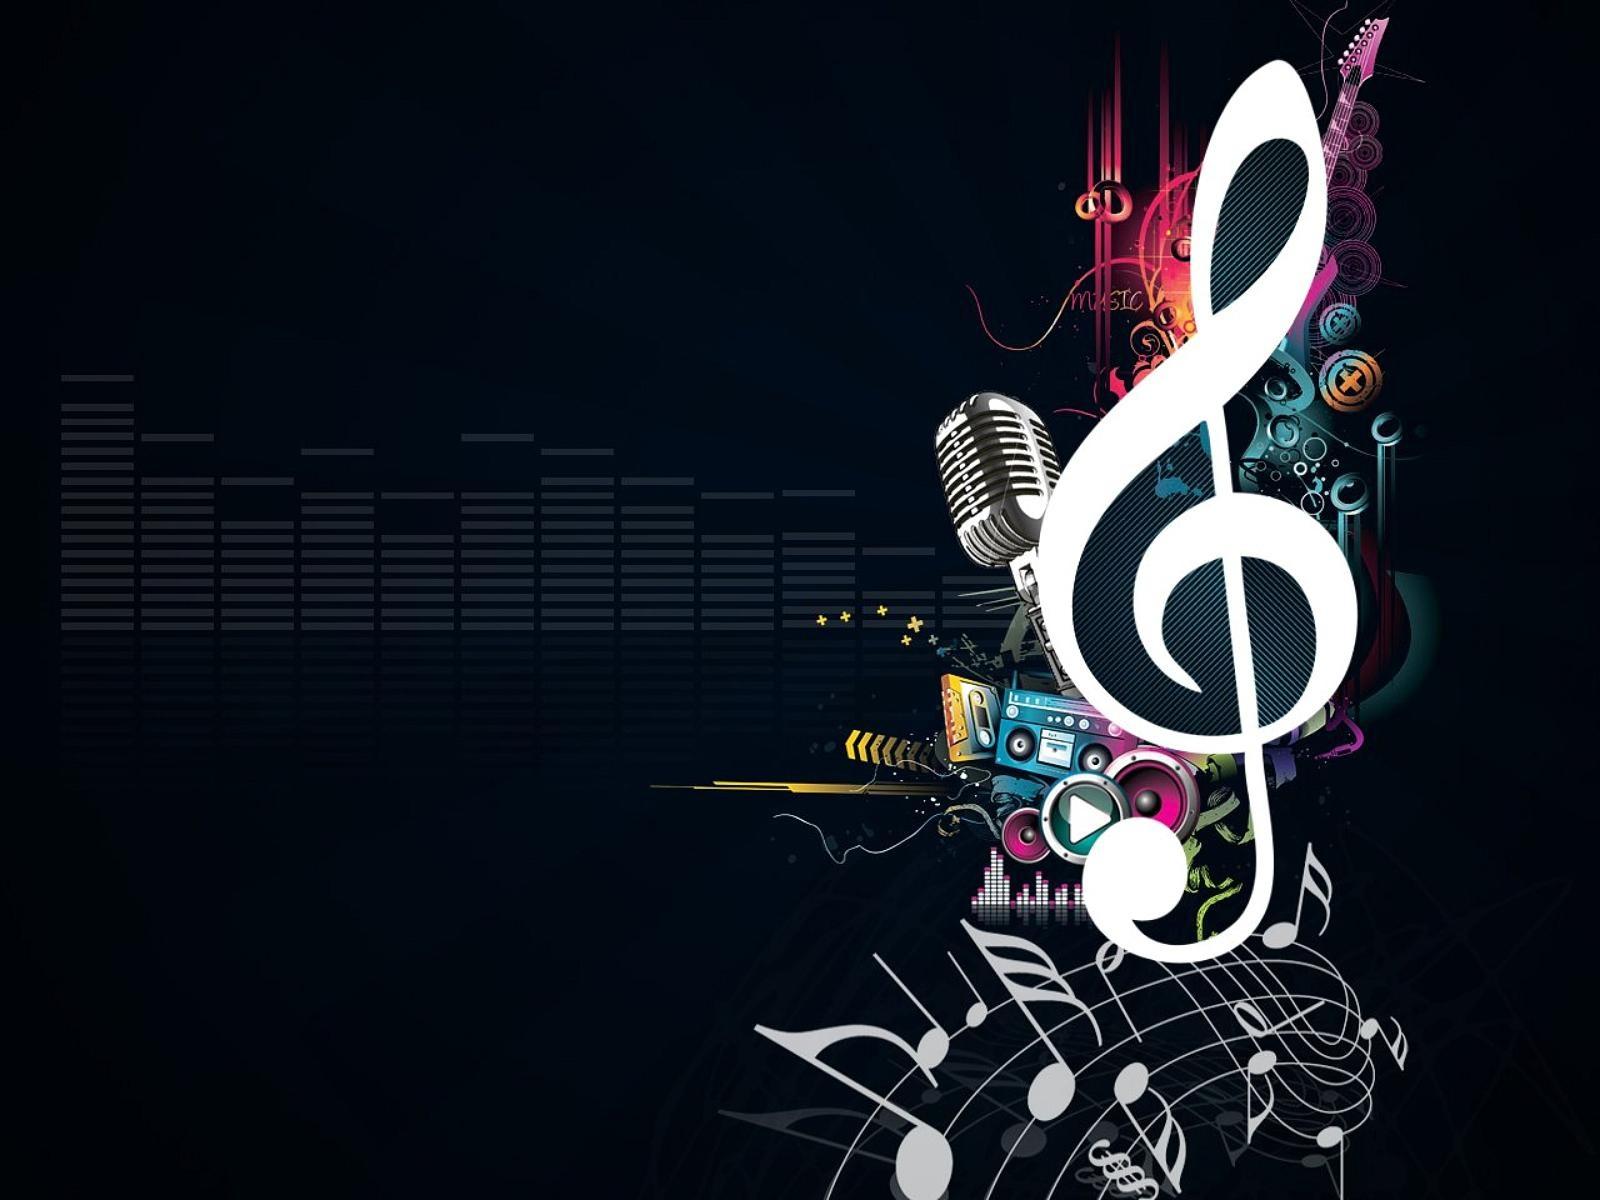 Hd Wallpapers Music Microphone Kb Jpeg